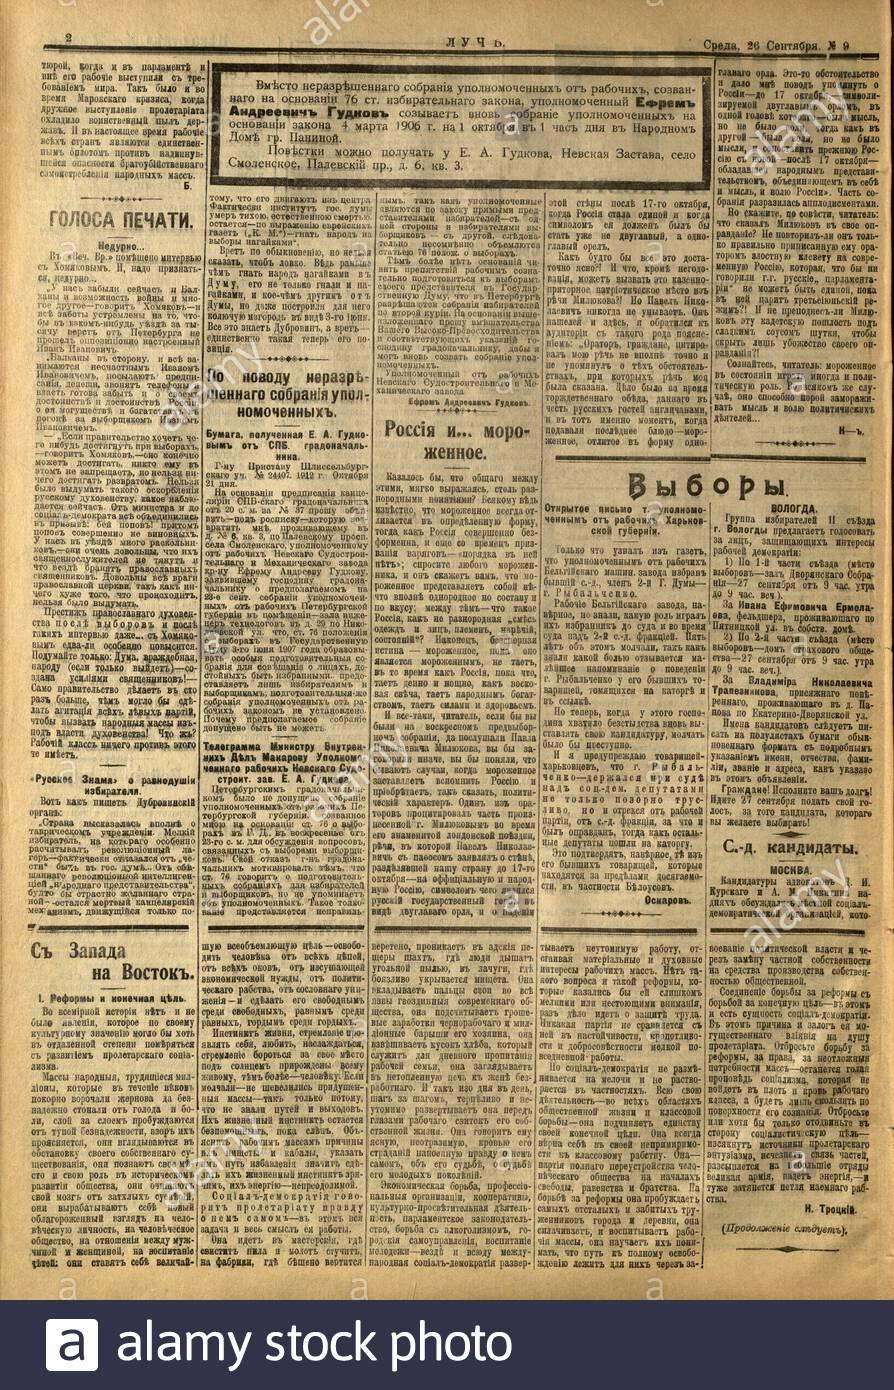 Русский: Луч № 9 (Газета, 26 Сентября 1912); 26 September Regarding Saint Names Mexican Calendar